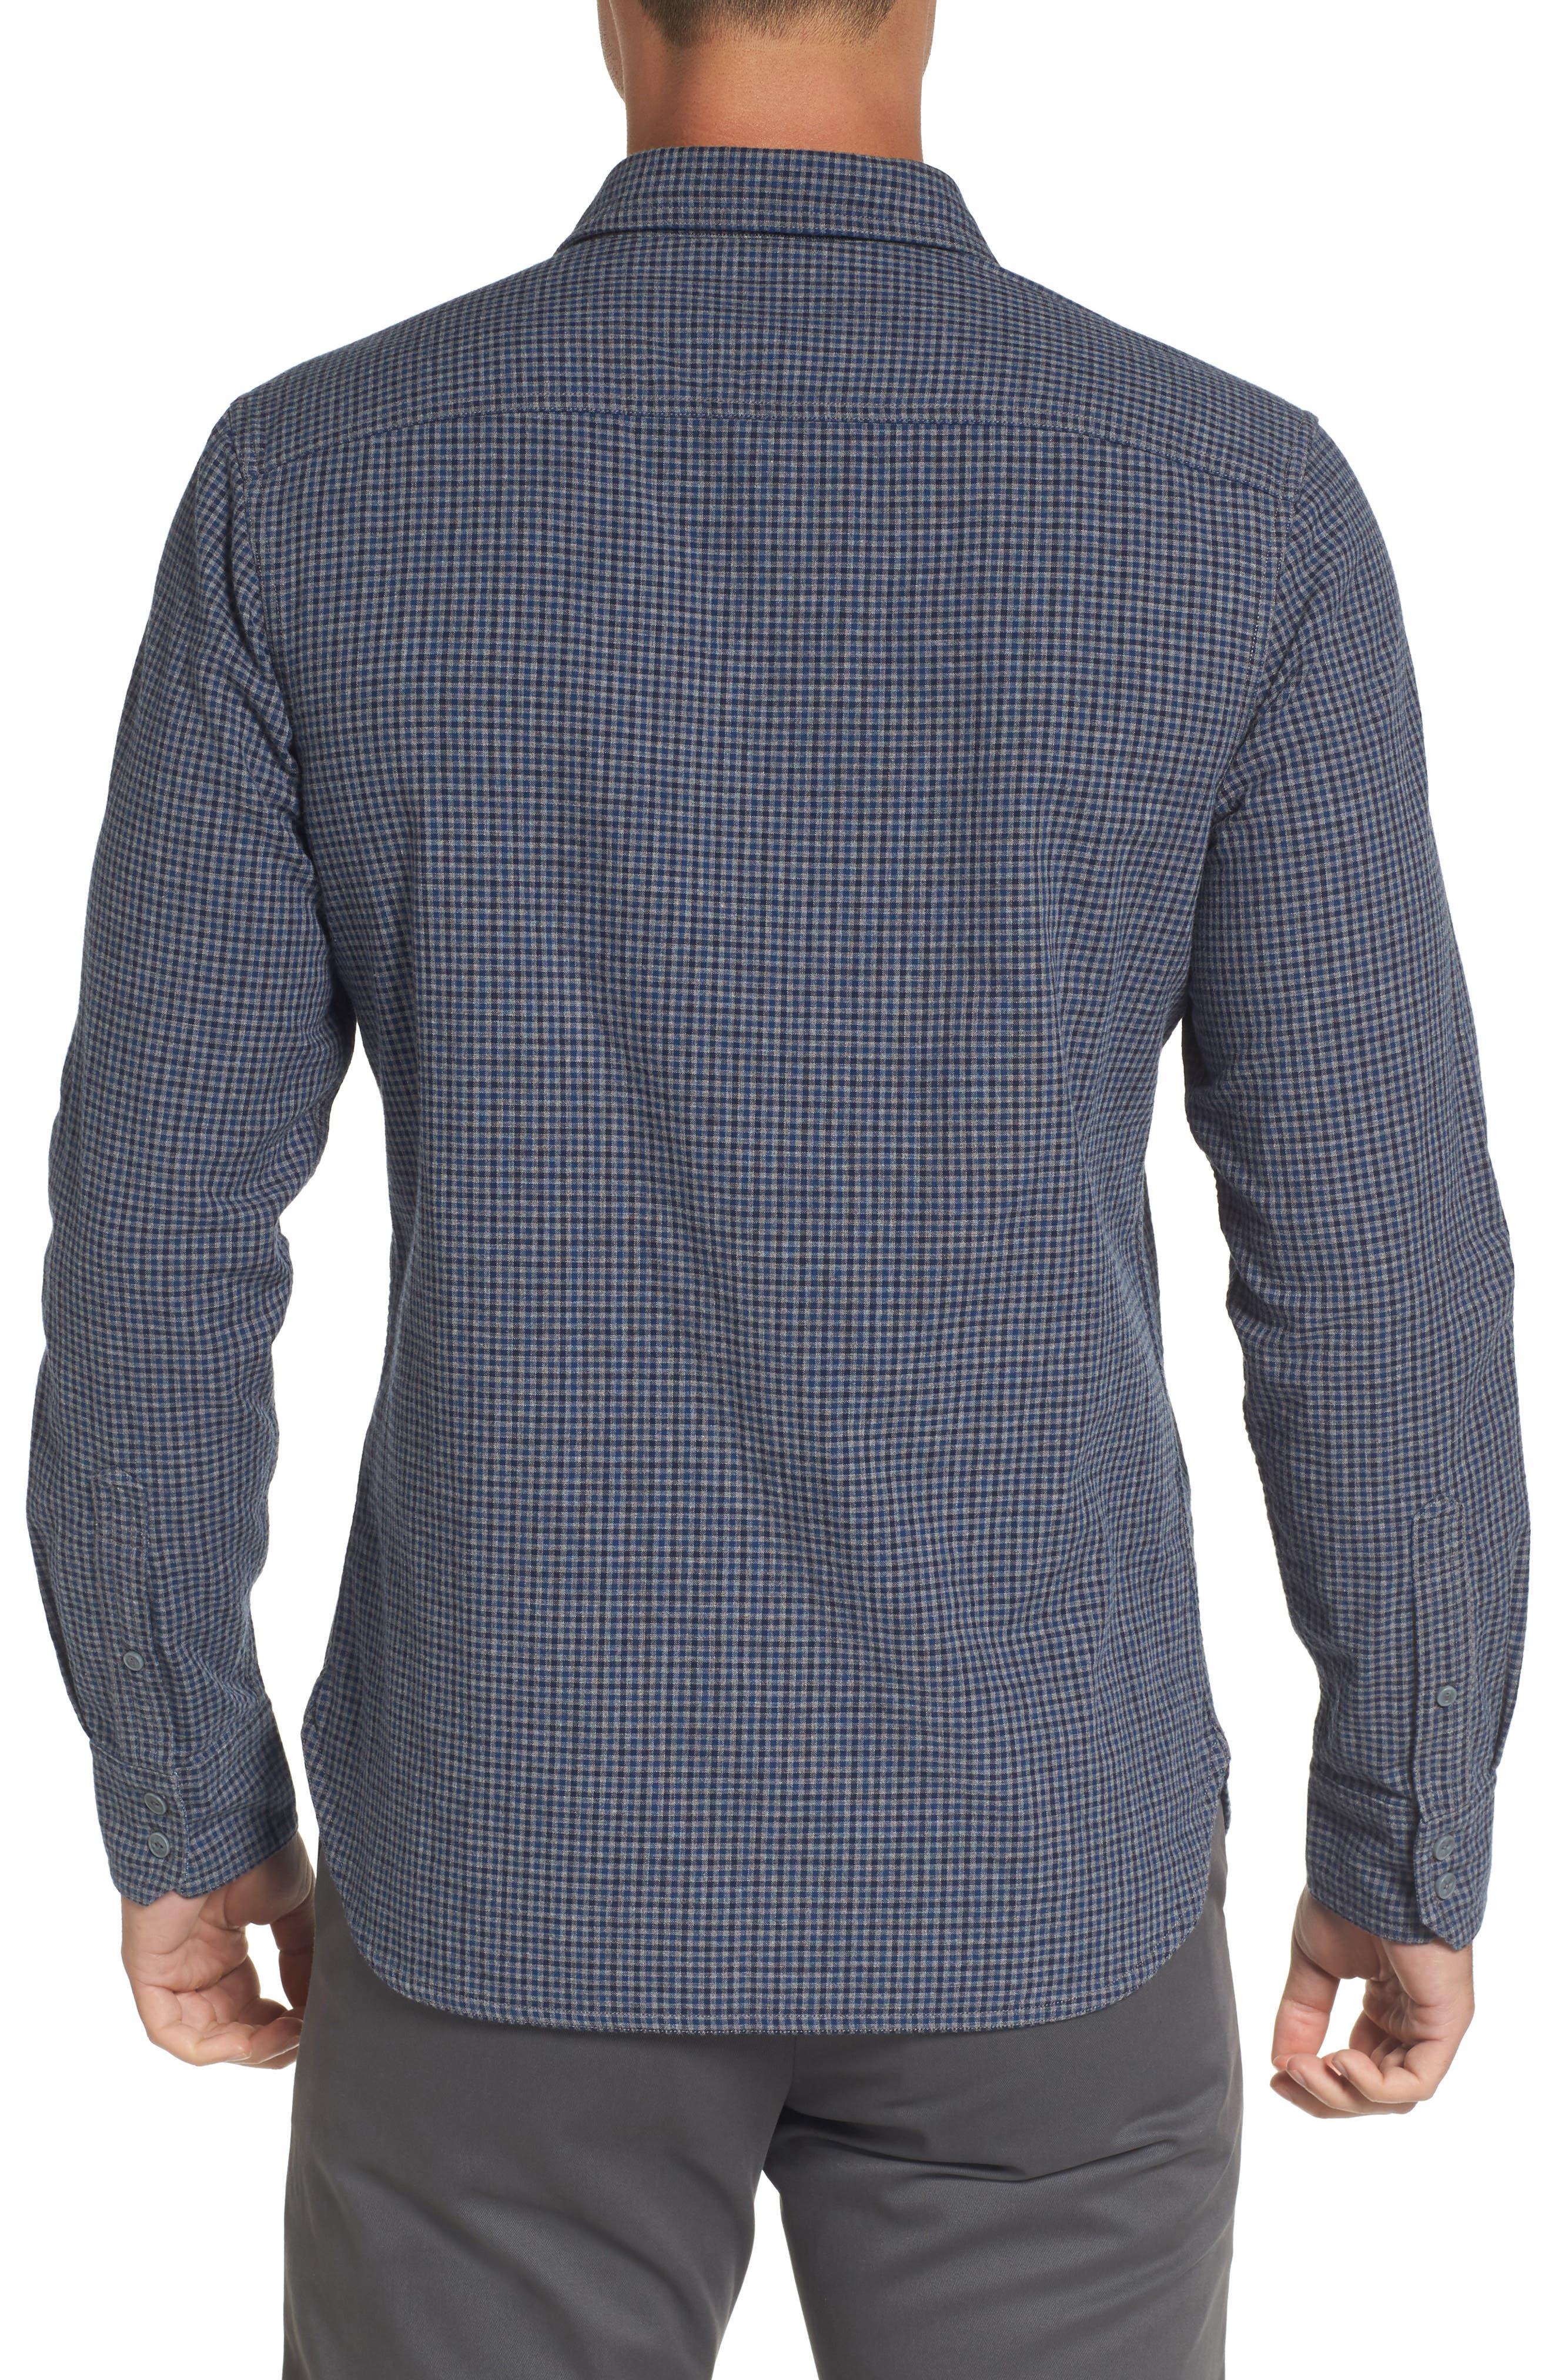 Alternate Image 2  - Nordstrom Men's Shop Slim Fit Micro Check Sport Shirt